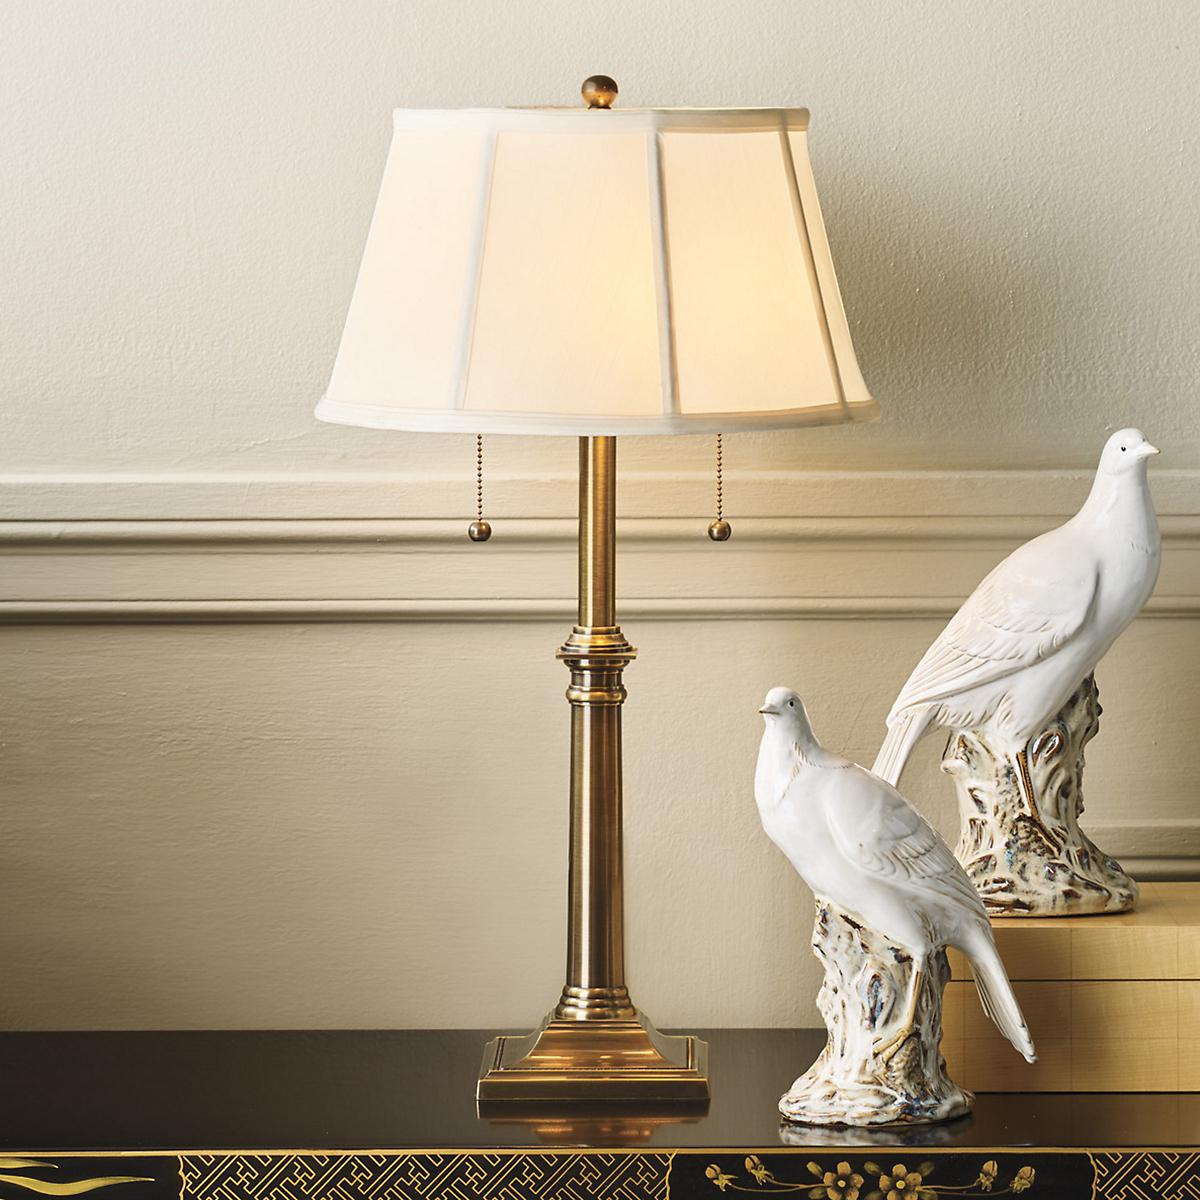 Brass hanover table lamp